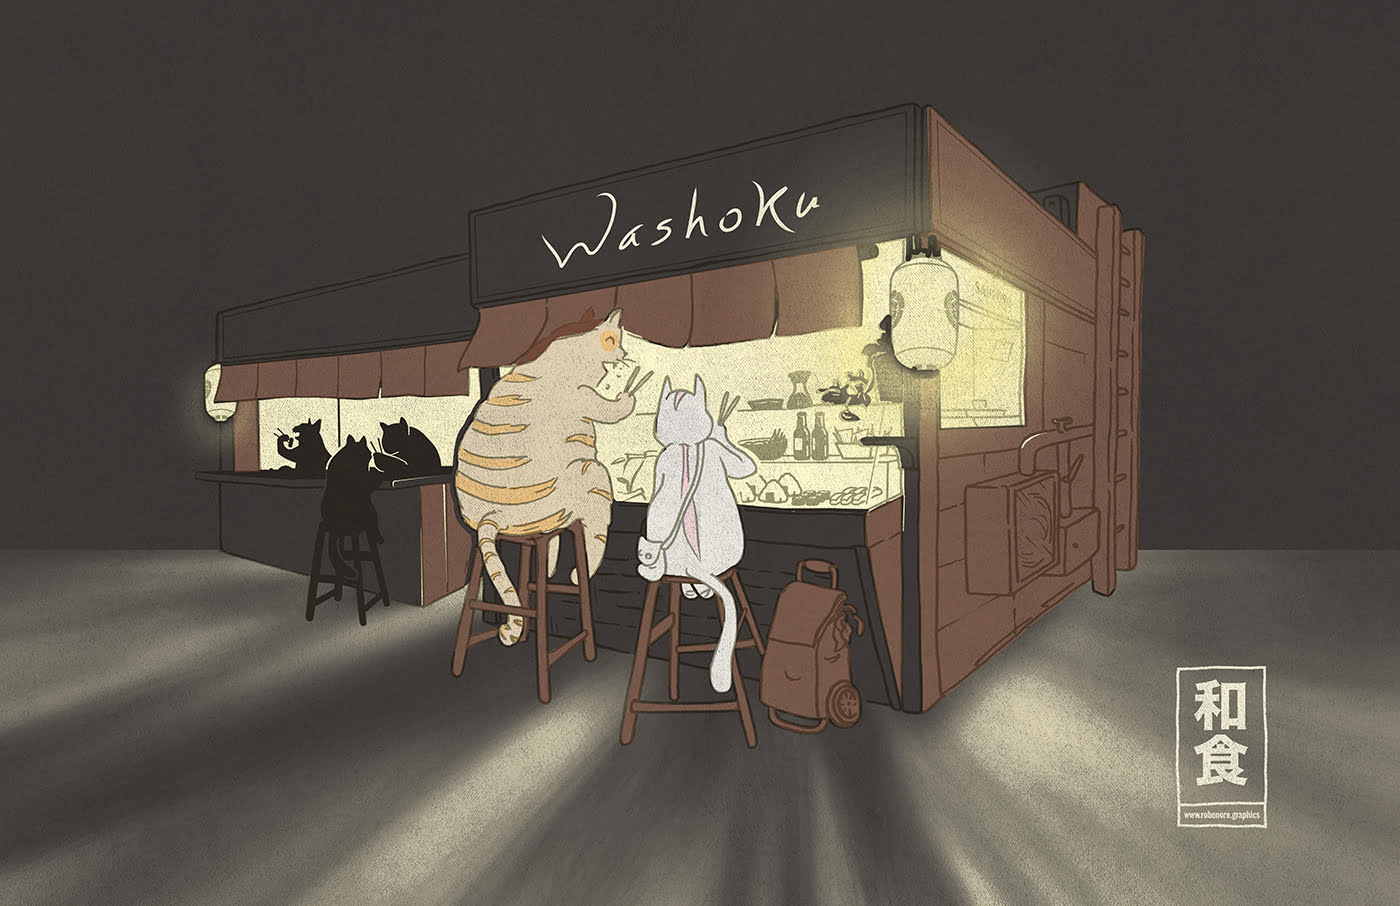 ilustraccion washoku robenore.graphics